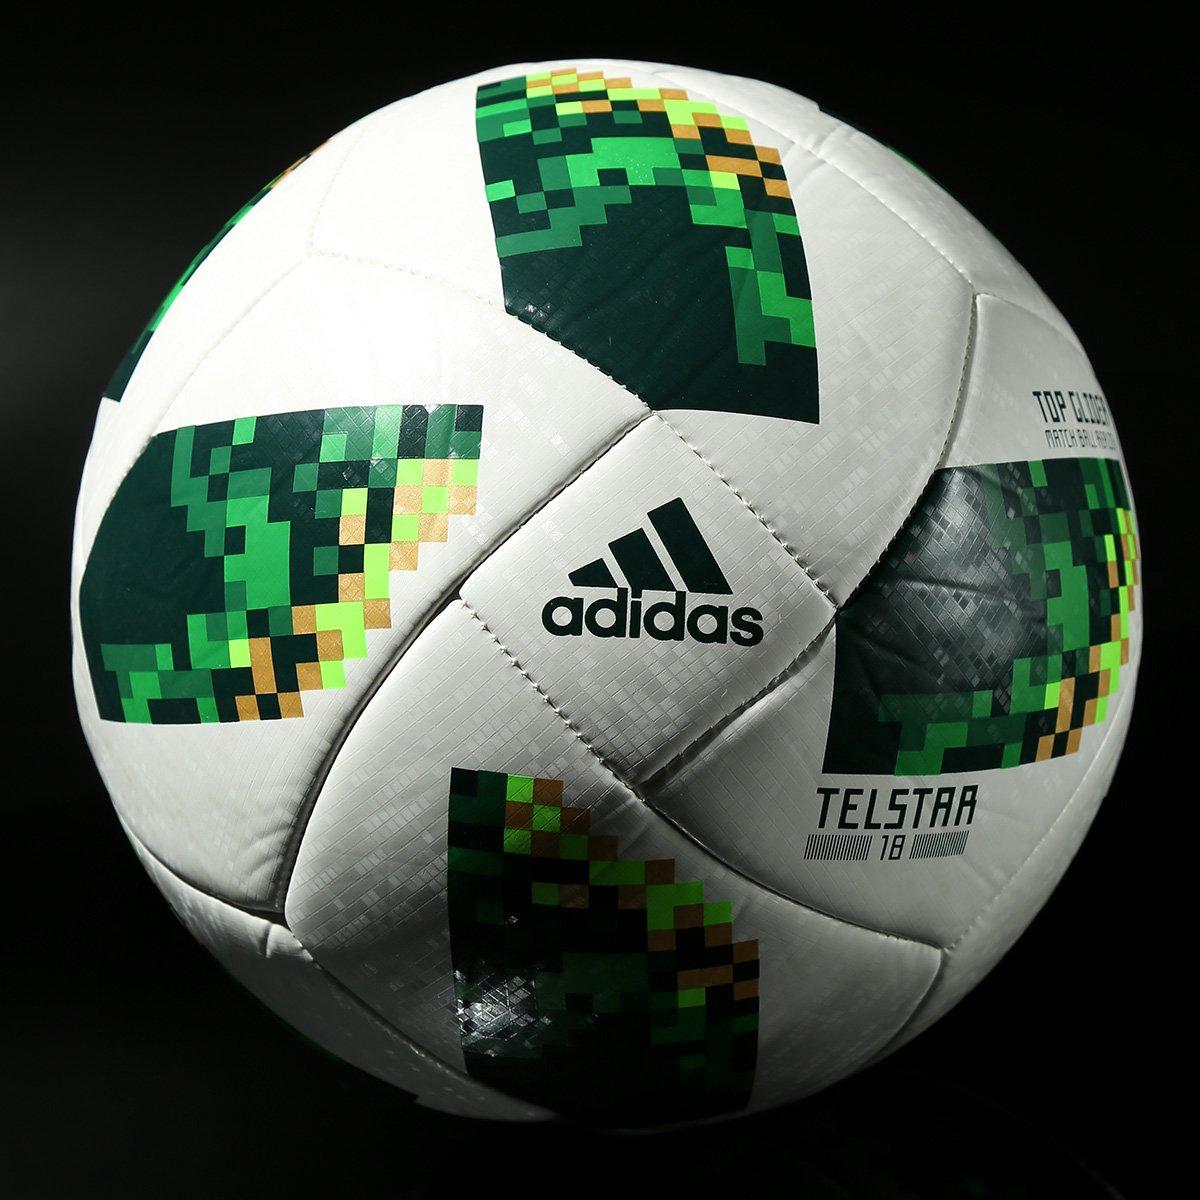 ... Bola Futebol Campo Adidas Telstar 18 TOP Glider México Copa do Mundo  FIFA ... f289fb8c28a17